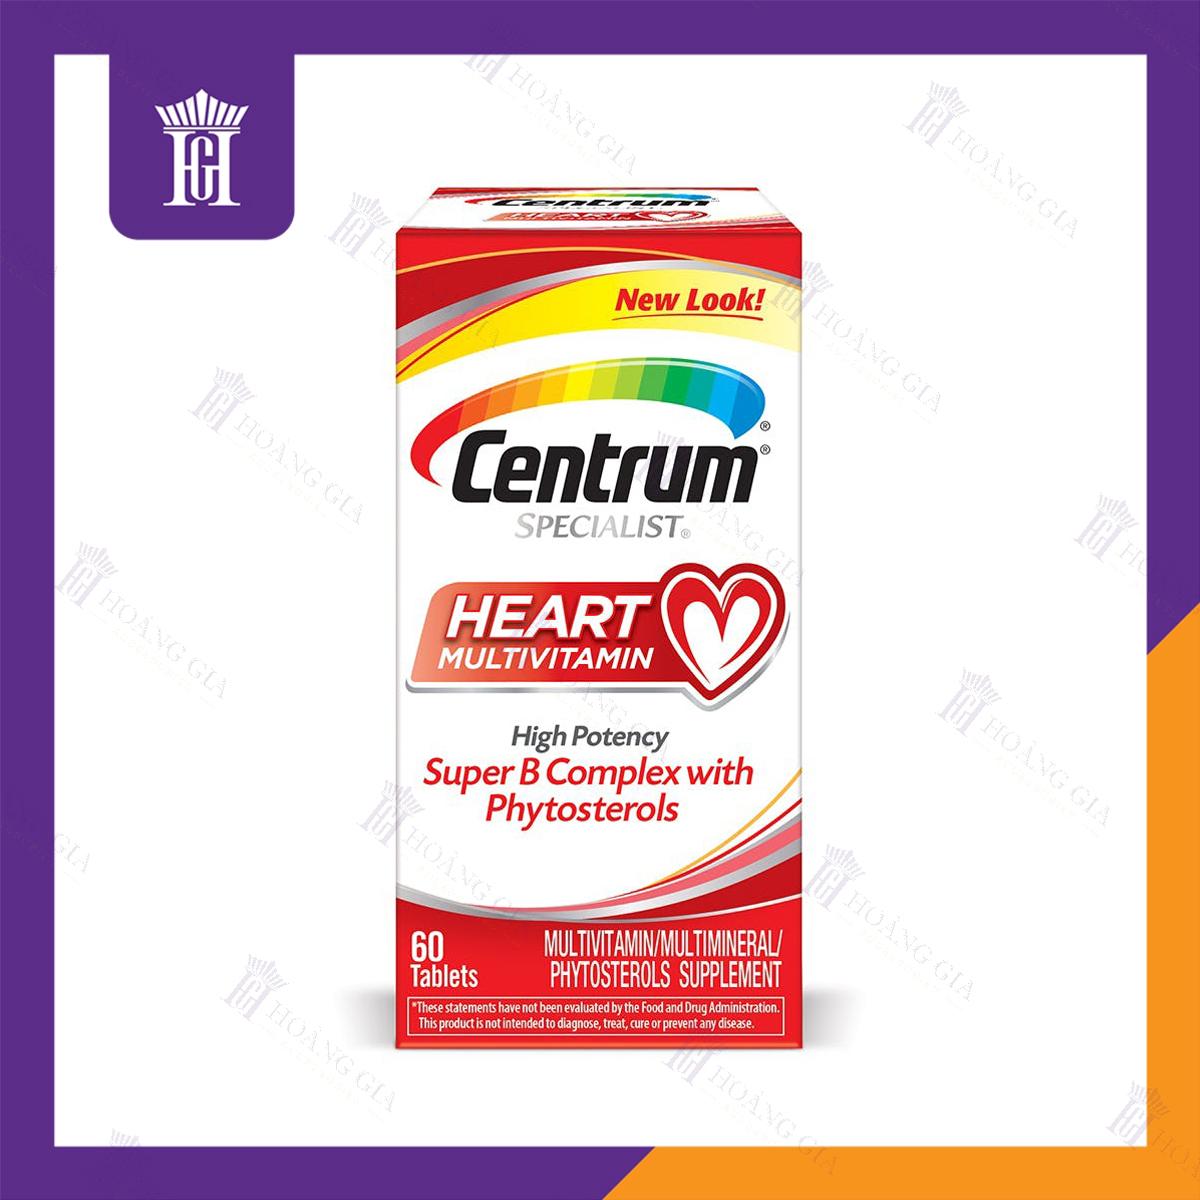 Vitamin tổng hợp Centrum Specialist Heart